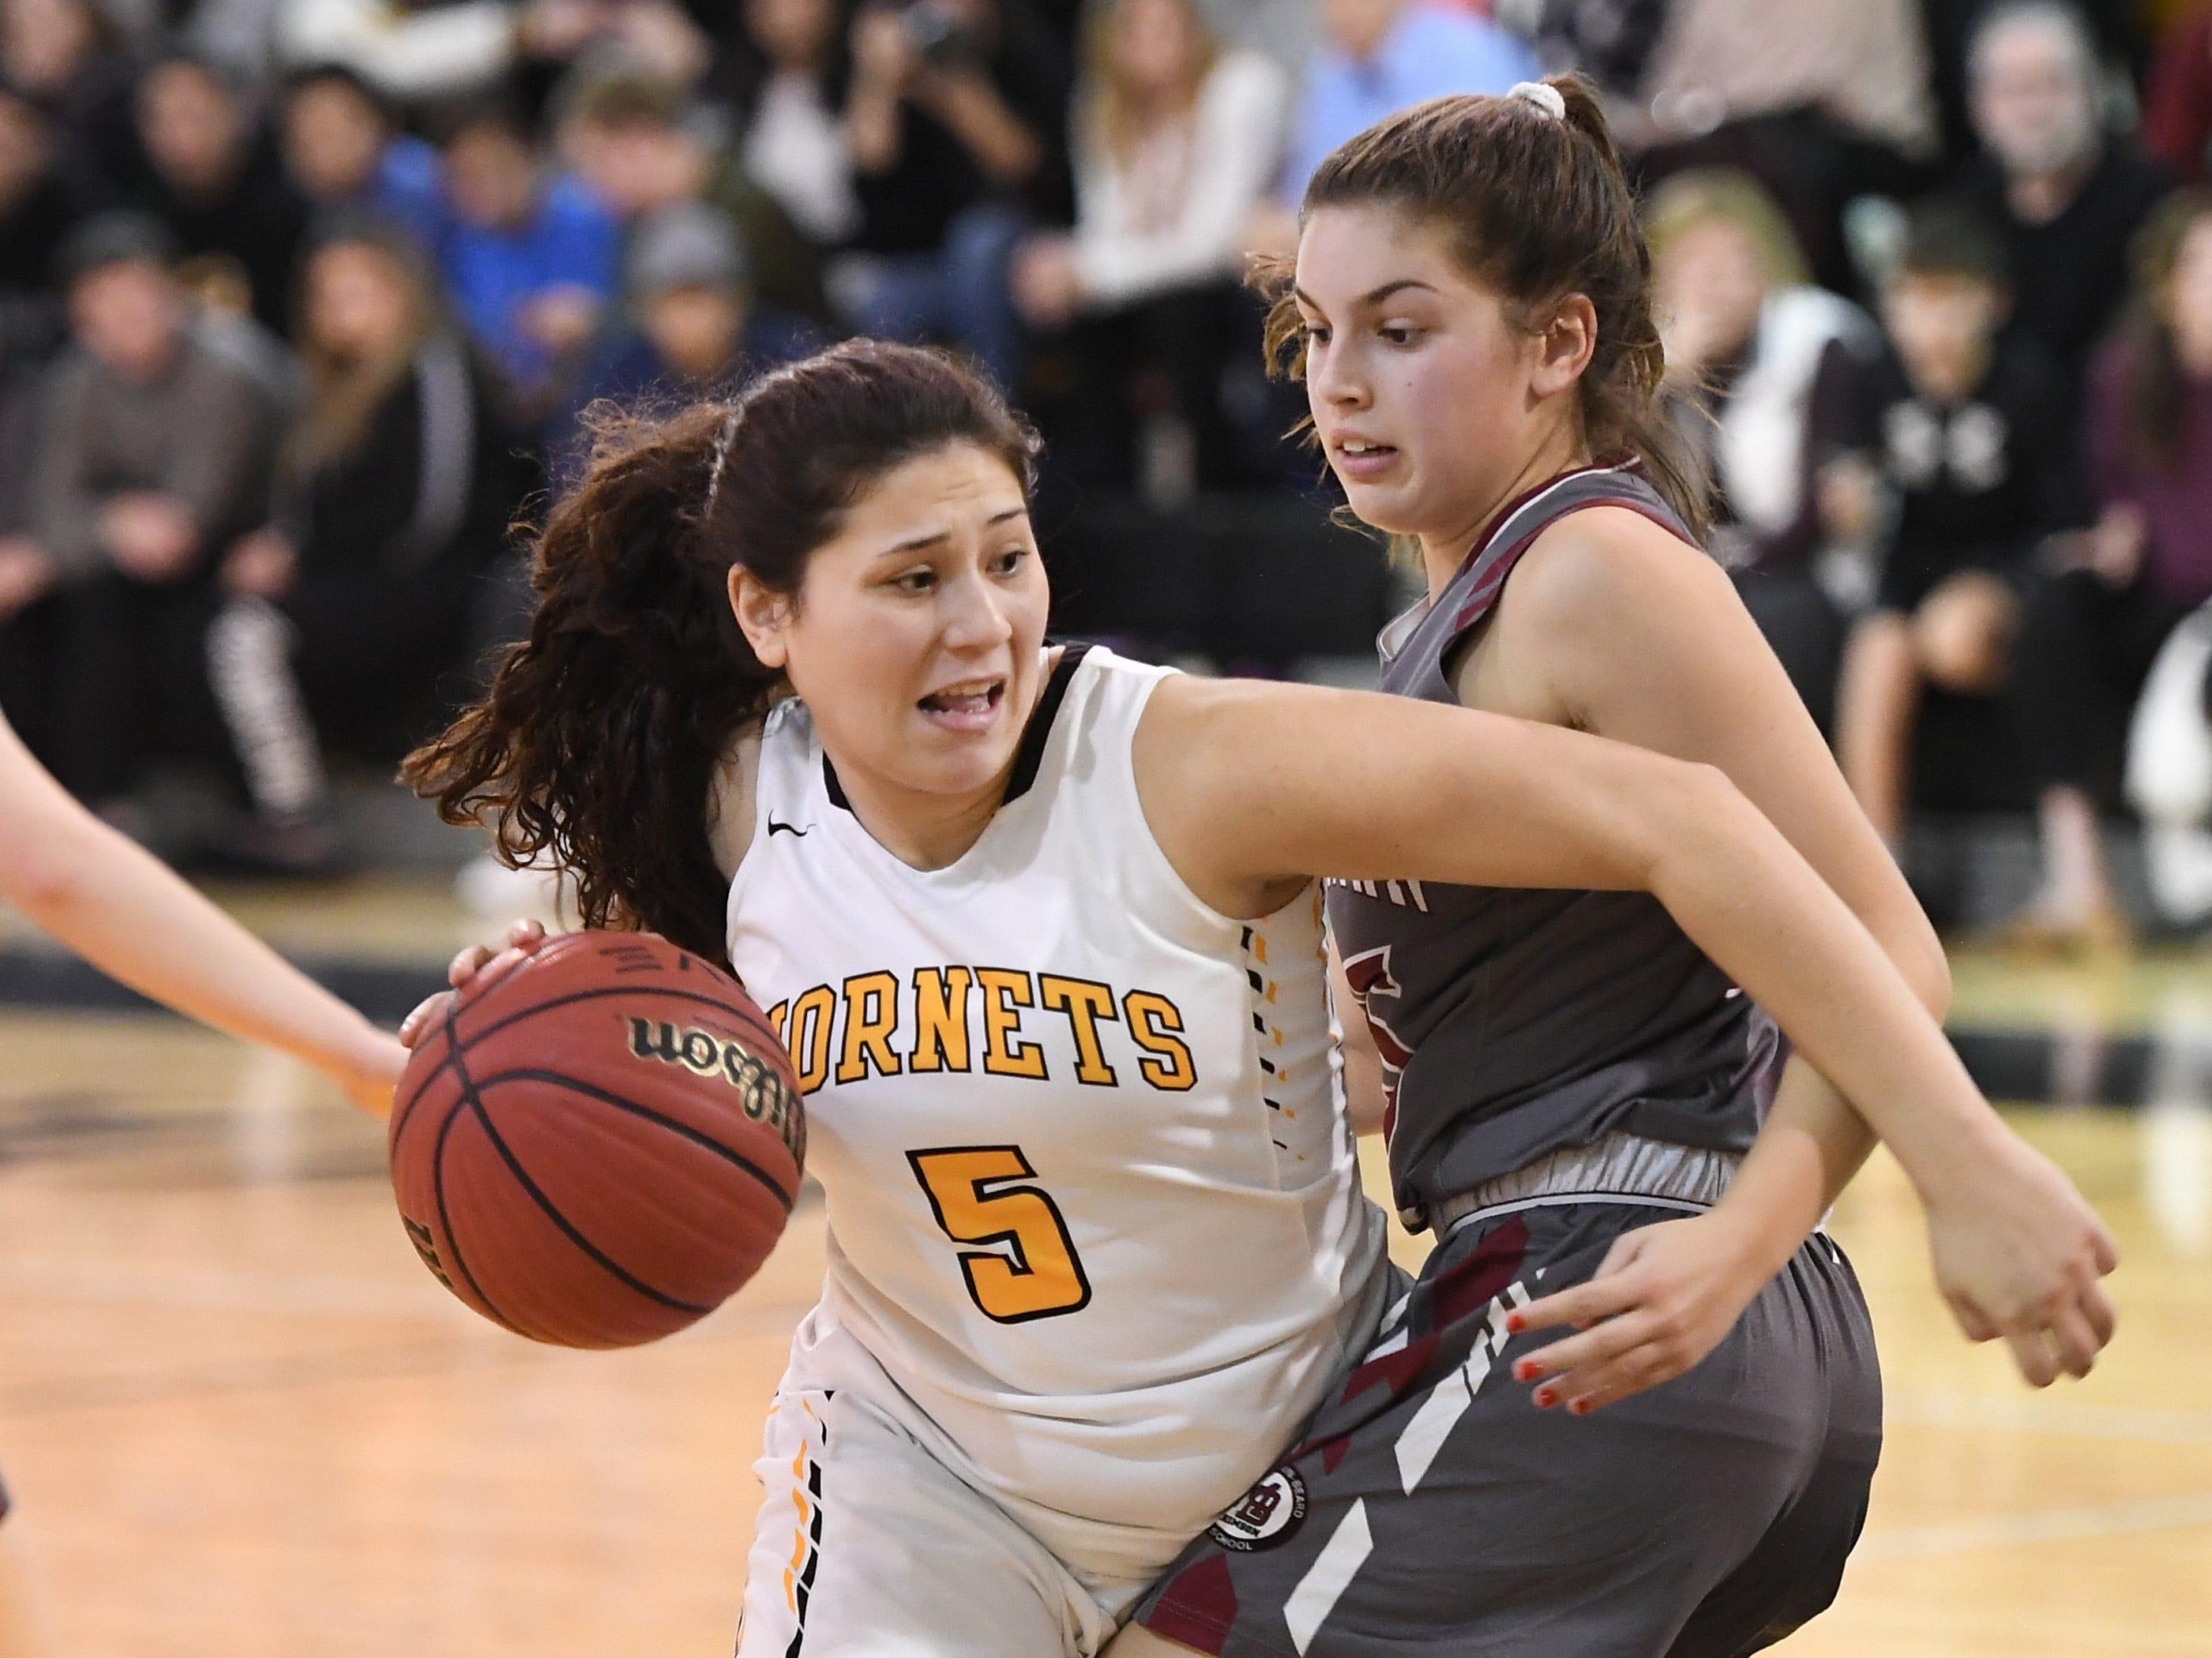 Morristown-Beard girls basketball at Hanover Park on Friday, January 4, 2019. HP #5 Olivia Cosenzo tries to get past MB #25 Christina De Mattheis .